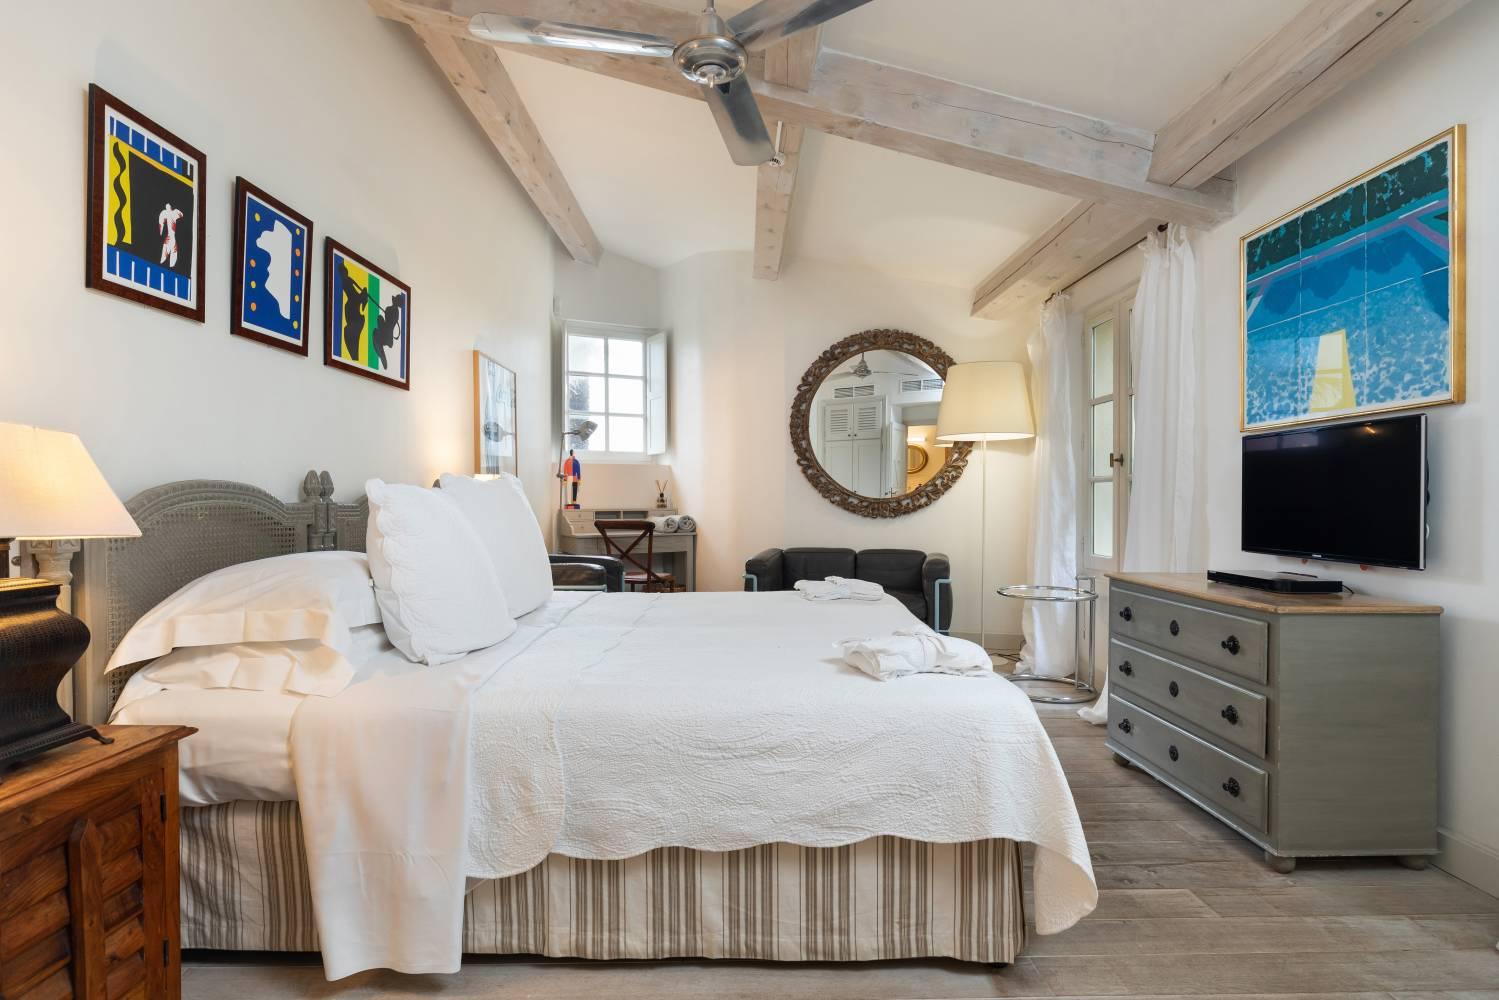 St Tropez Hotel Chambre